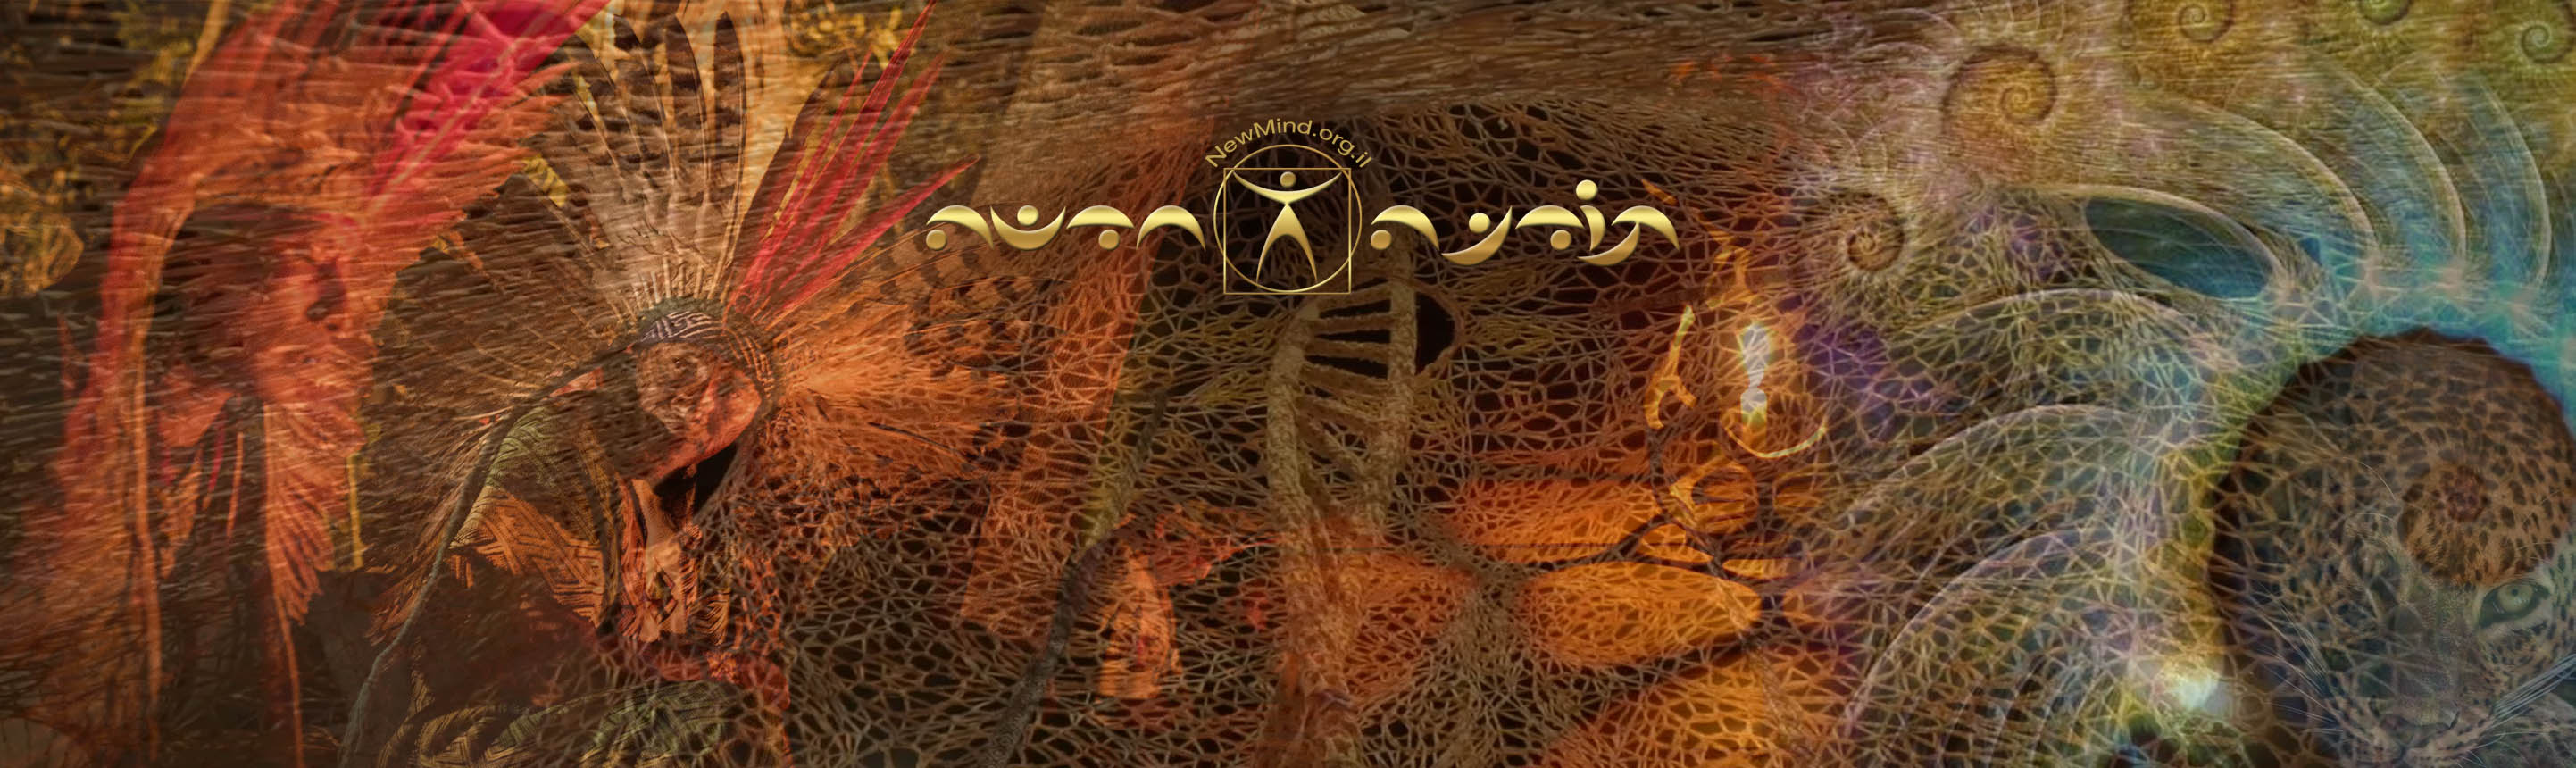 Ayahuasca-VoicesFromTheAmazonas